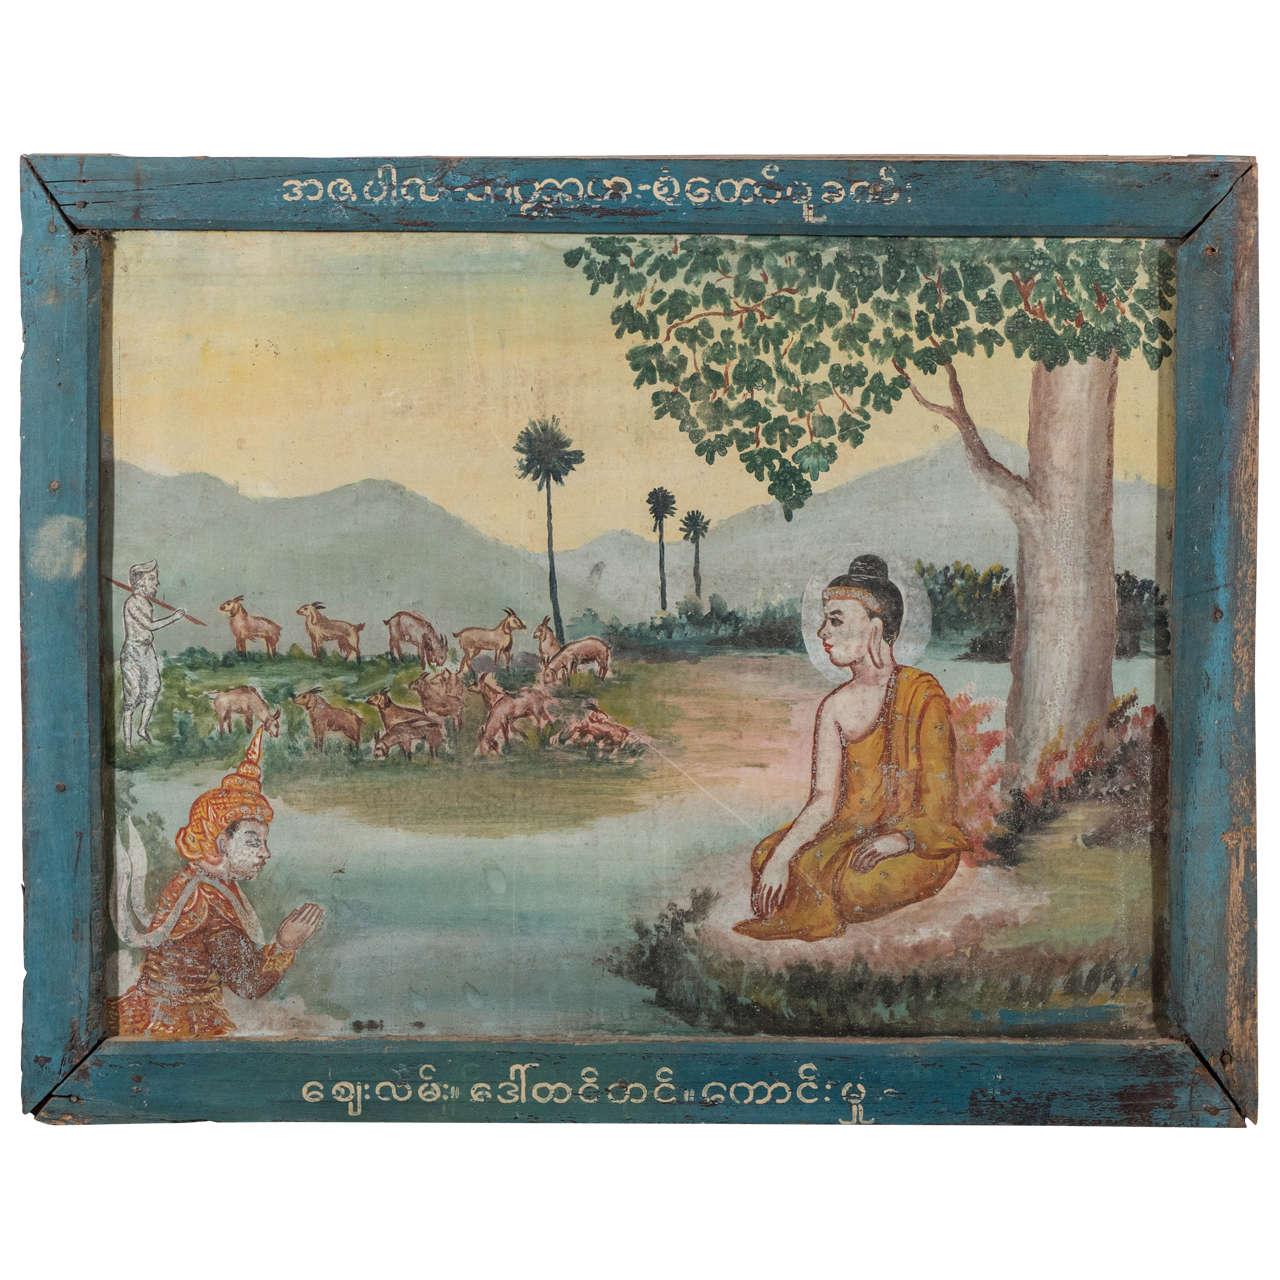 Burmese Temple Painting on Tin